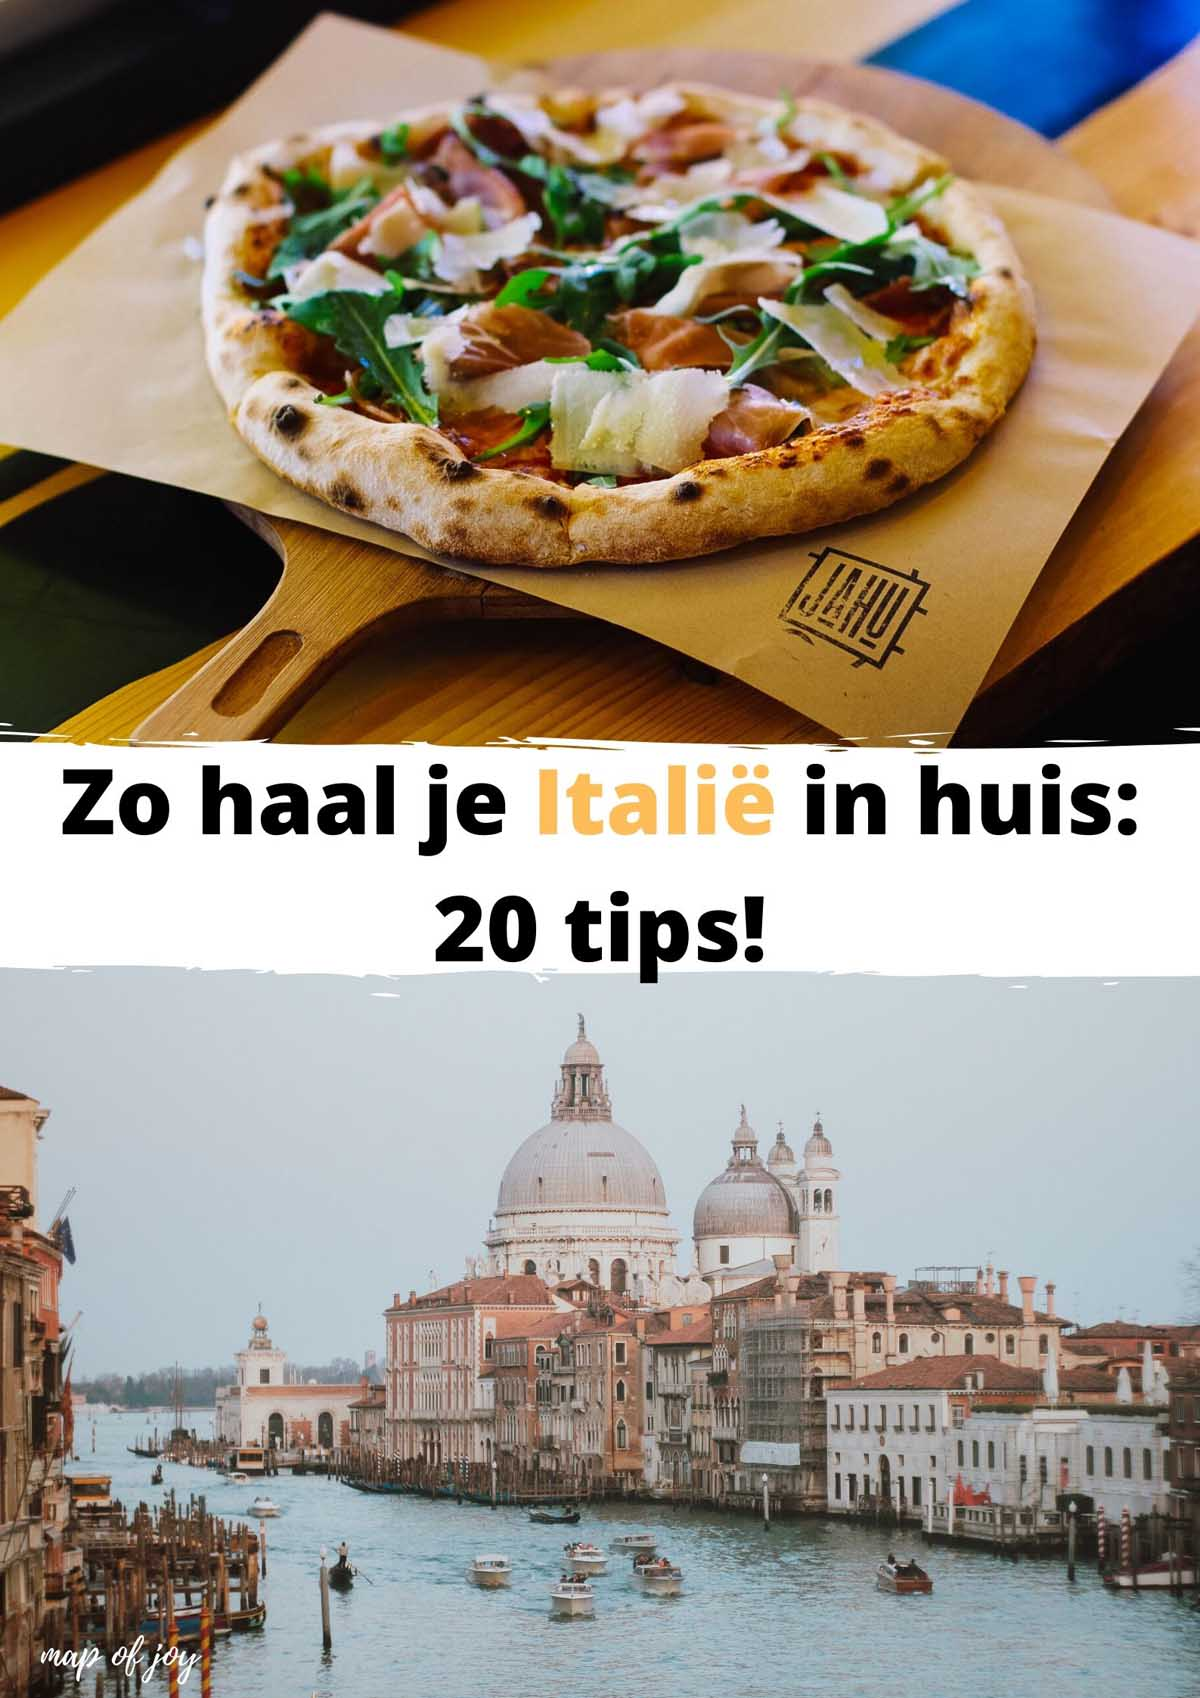 Zo haal je Italië in huis: 20 tips!